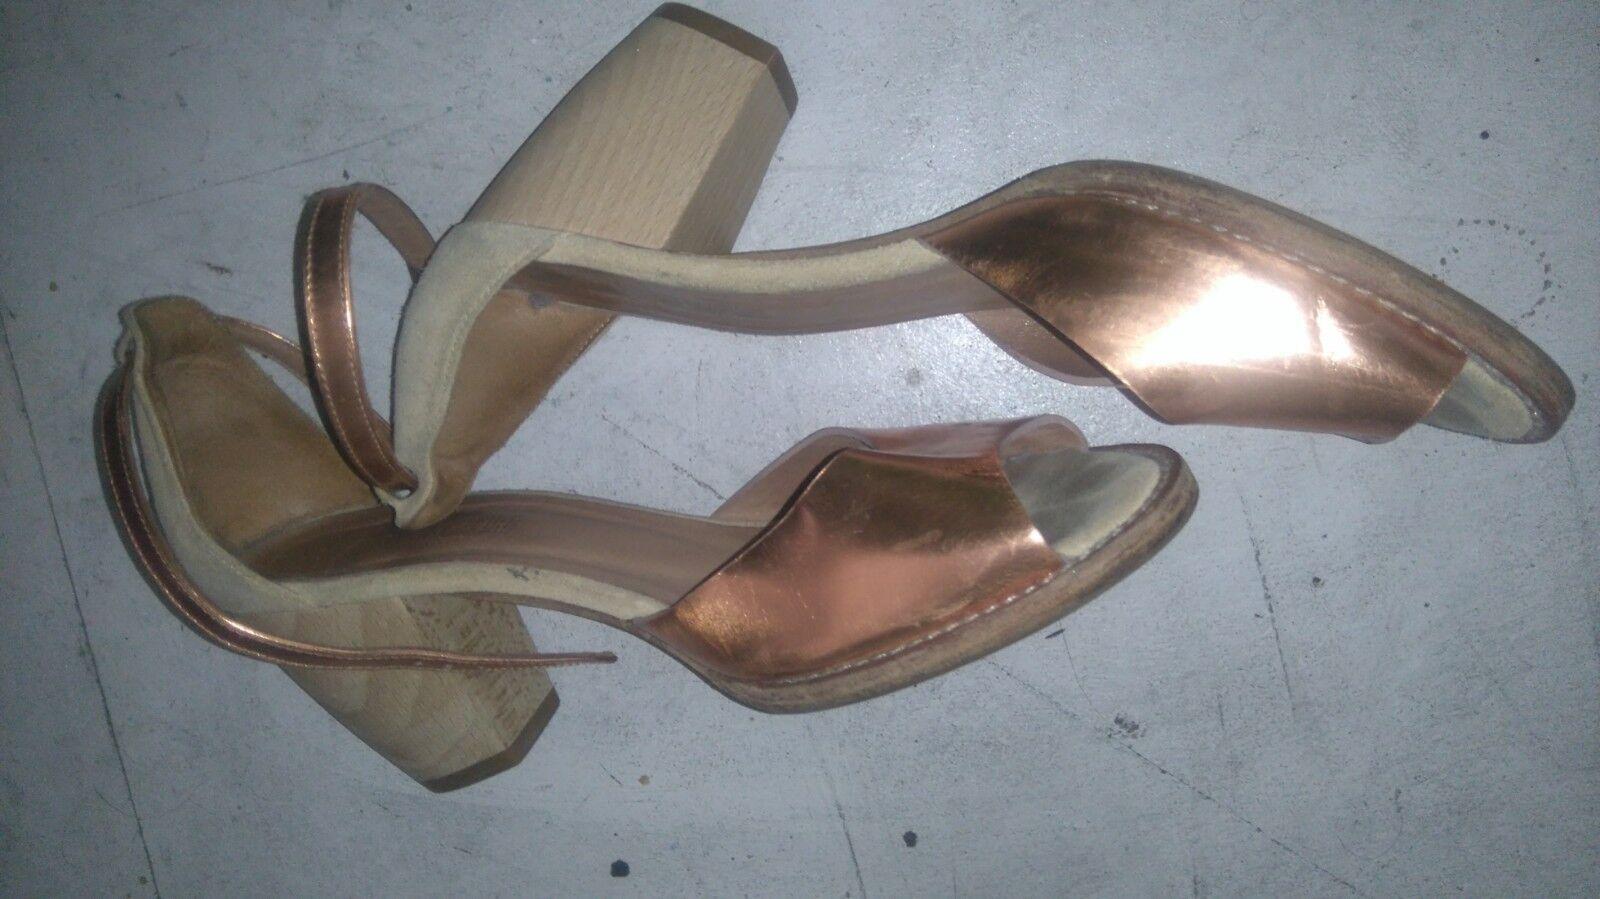 Damenschuhe Anaid patent Kupri high heeled Sandales patent Anaid bronze ankle strap Größe38 open toe 9f86af